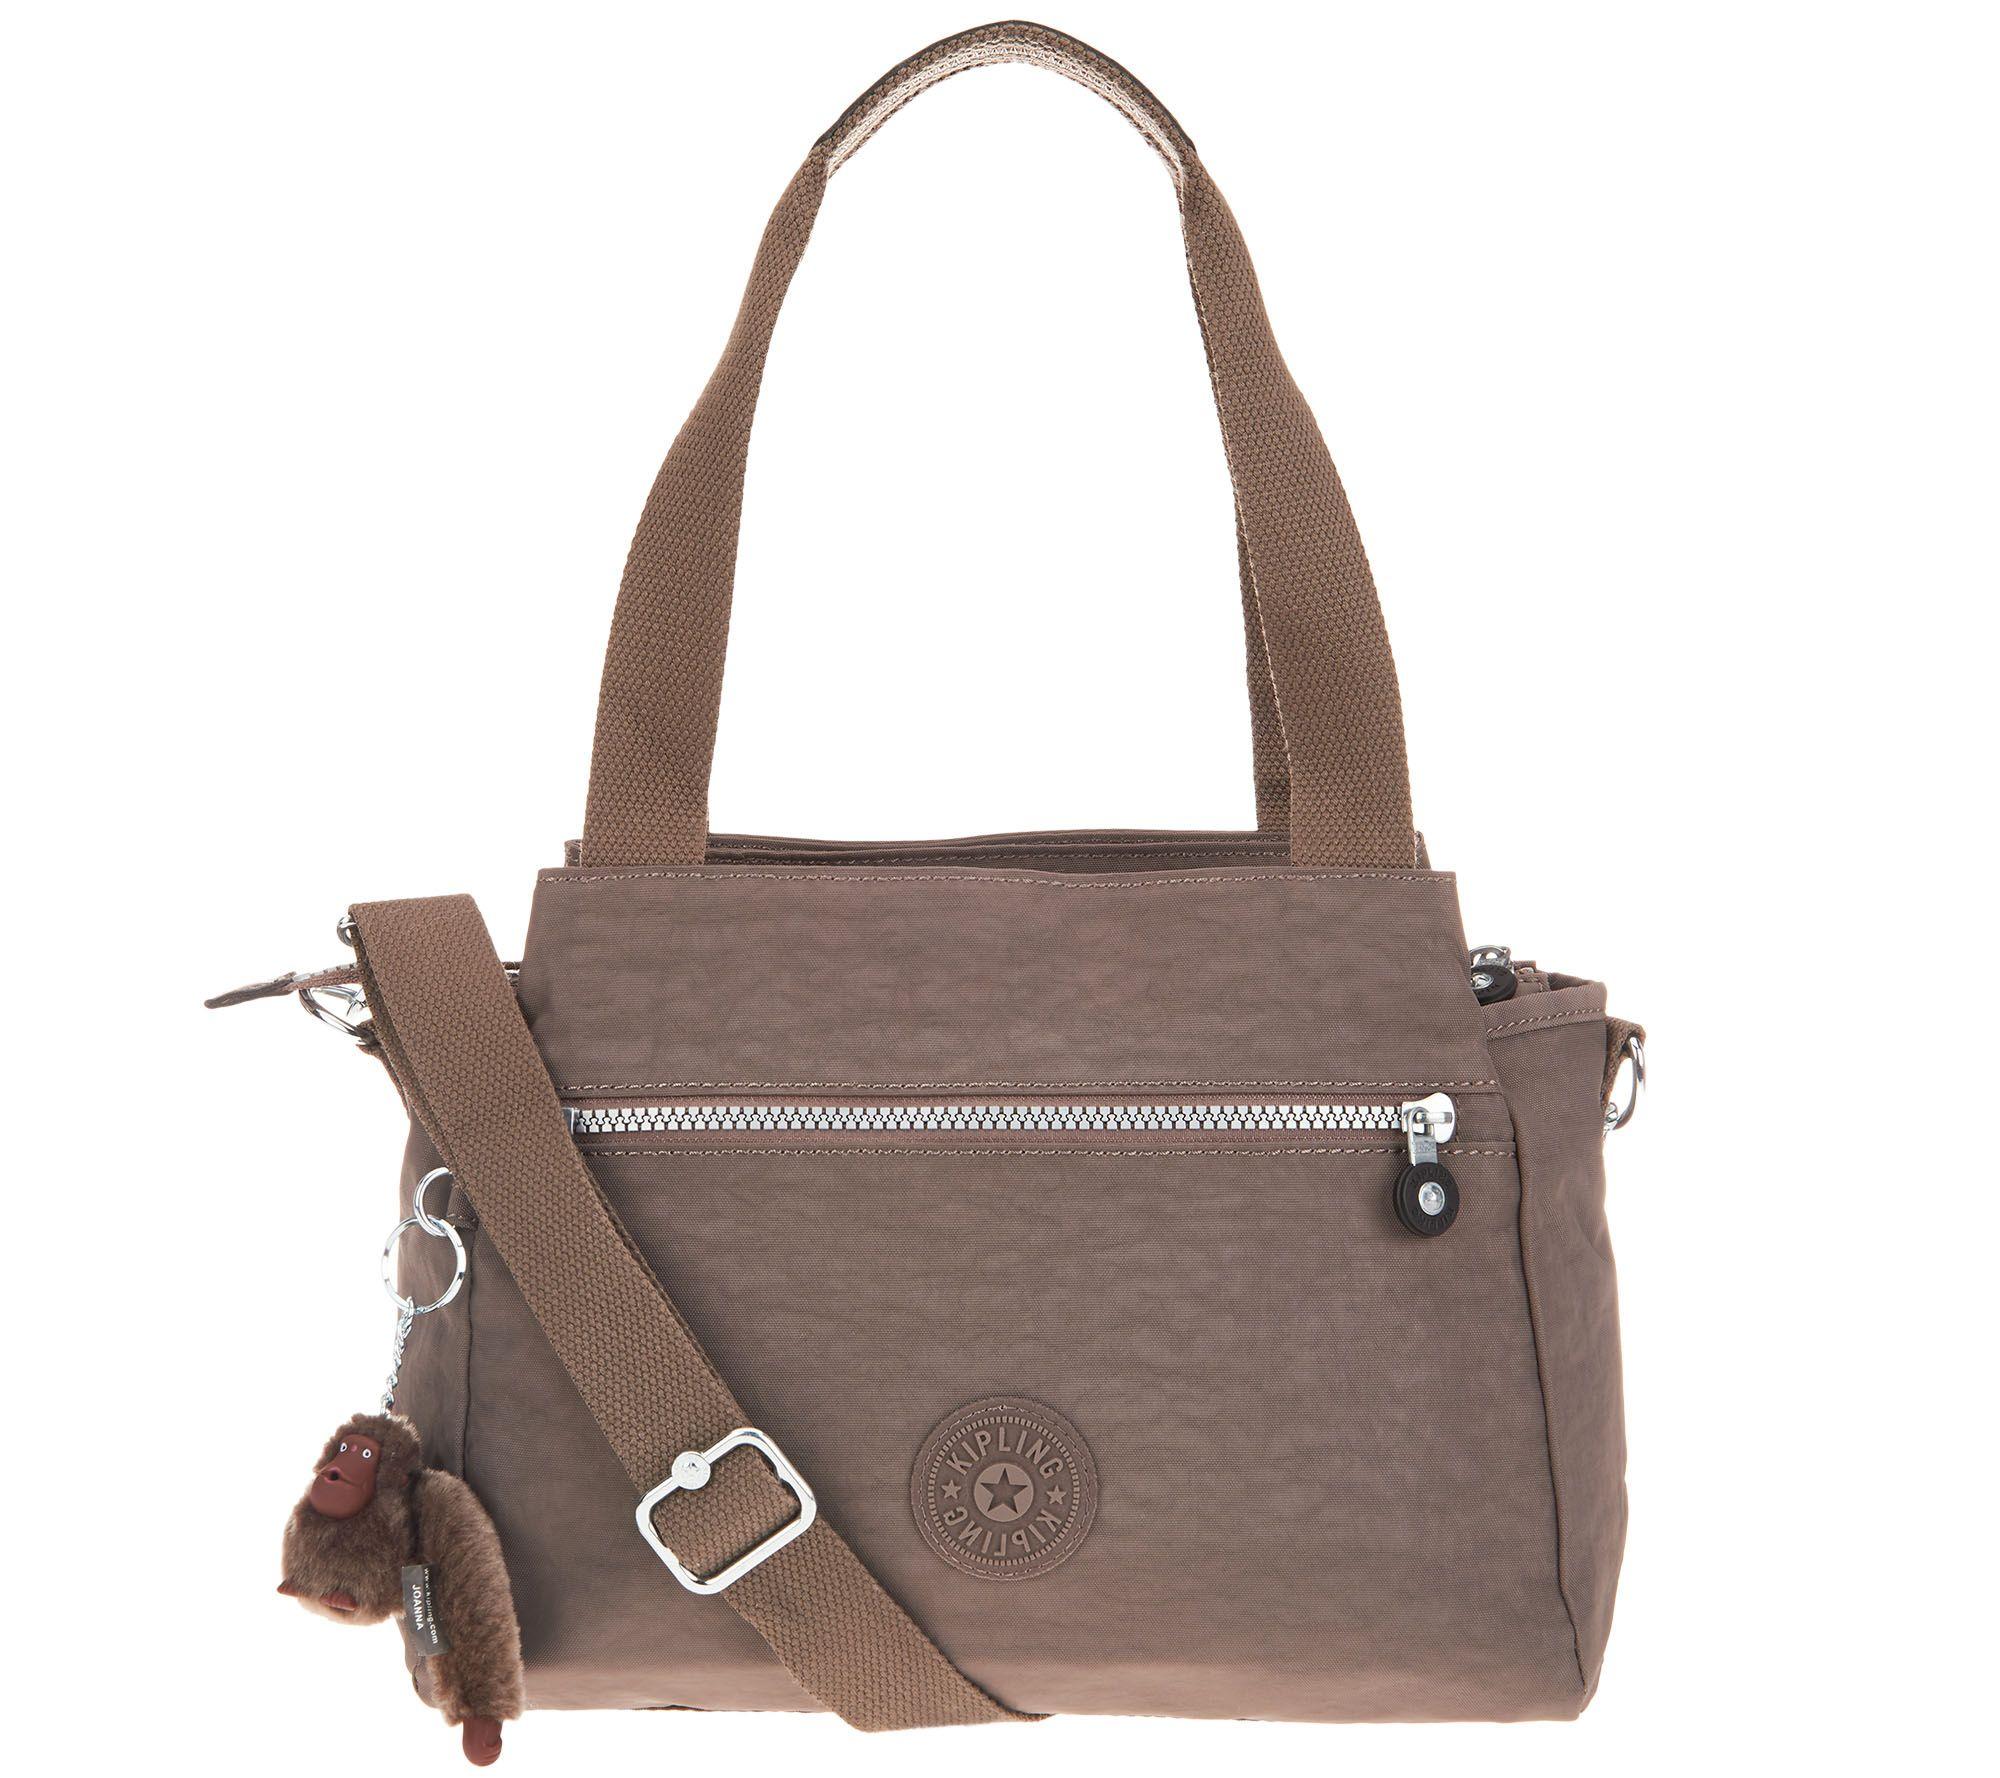 Kipling Convertible Satchel Handbag Elysia A304380